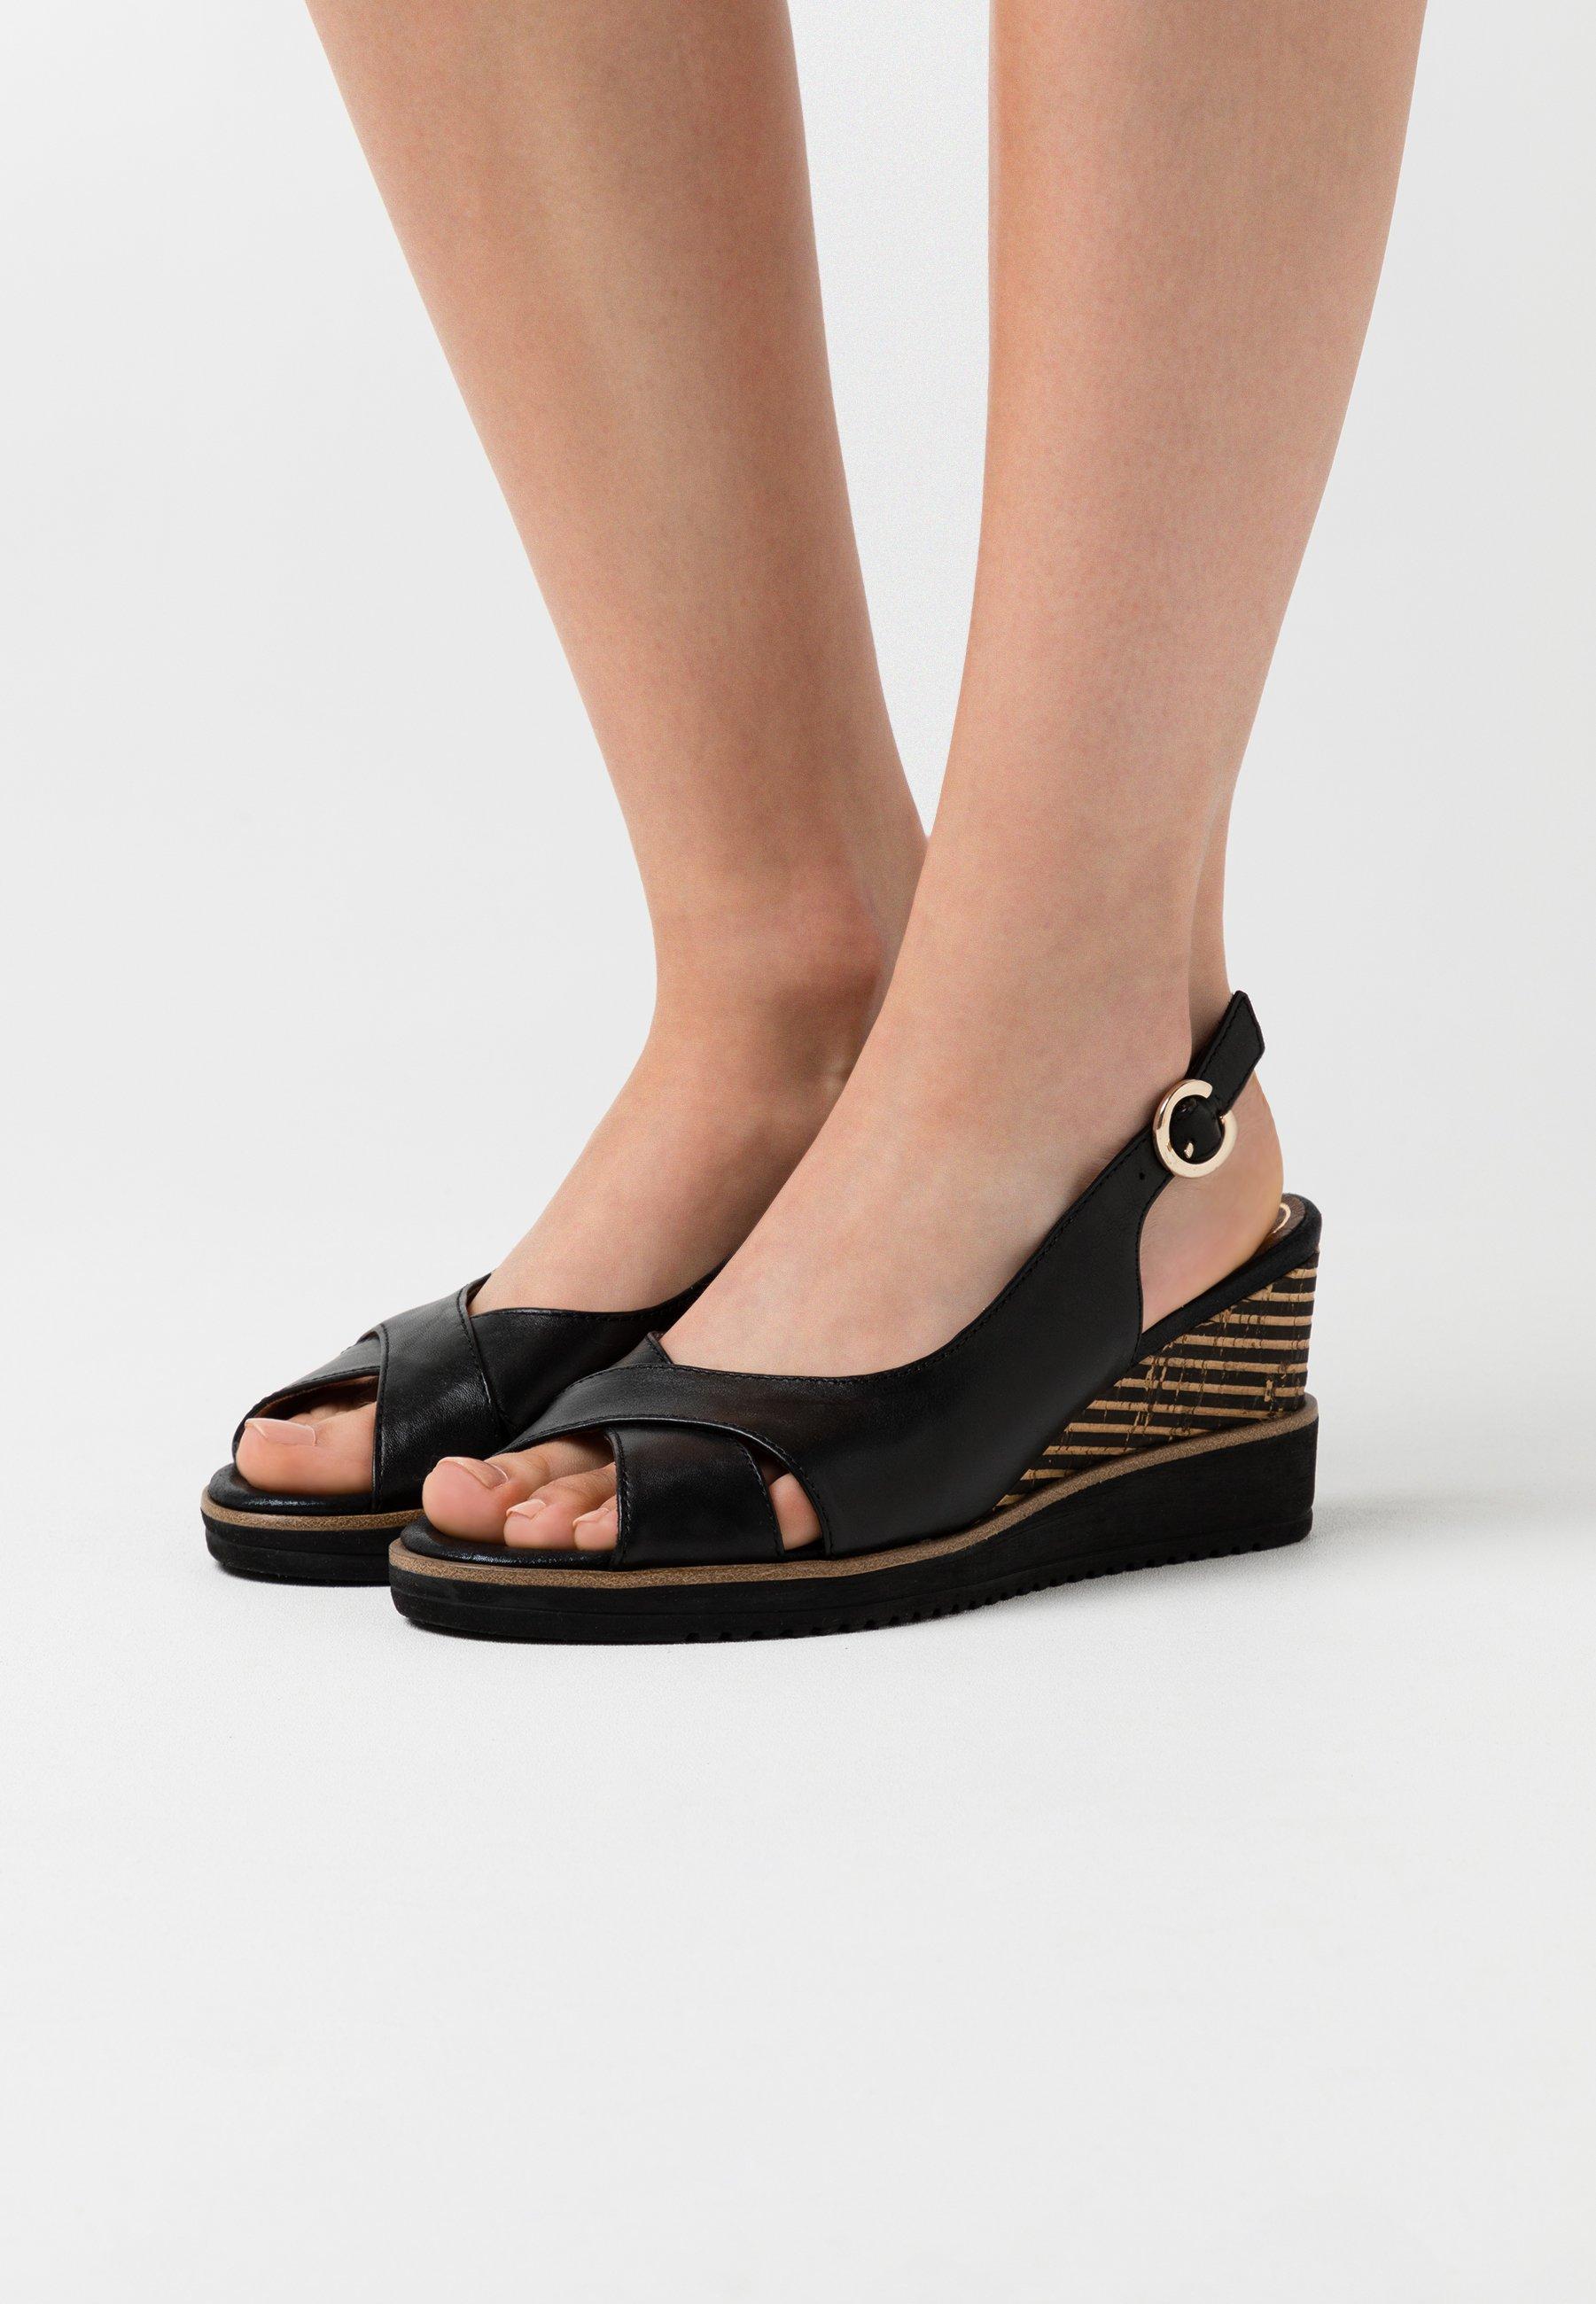 sandales compensees zalando,baskets compensees kookai